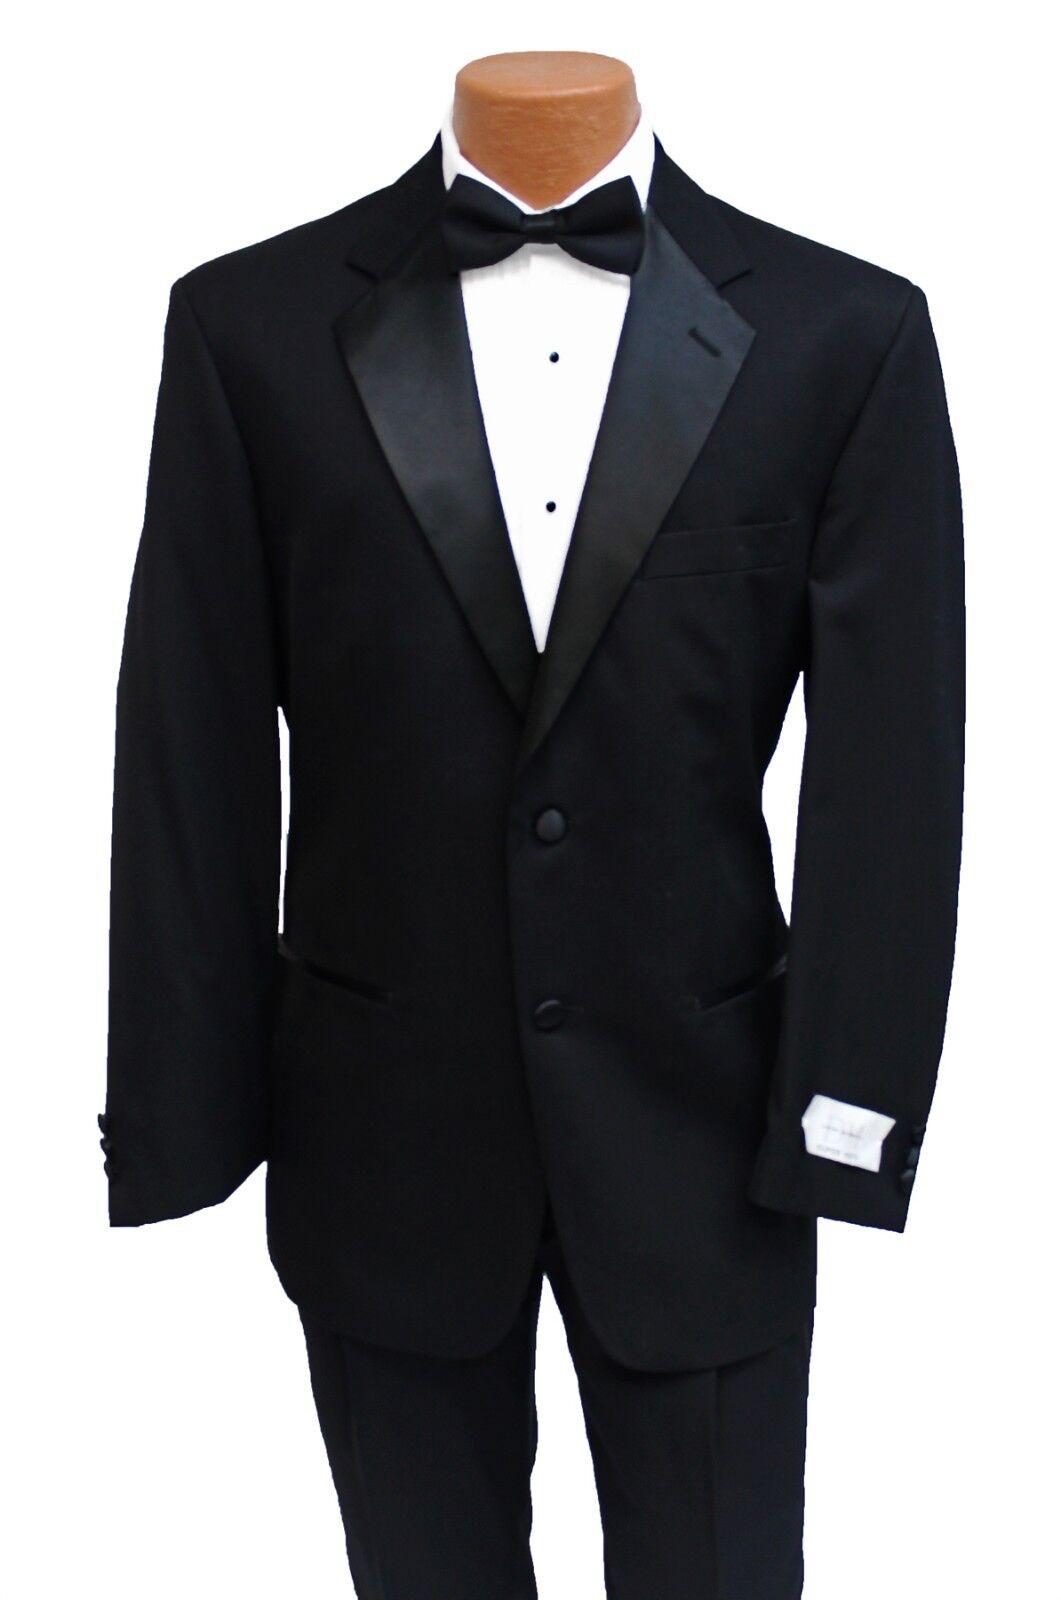 39S New Classic Black Tuxedo Jacket & Pant Suit Prom Wedding Formal Gala Tux